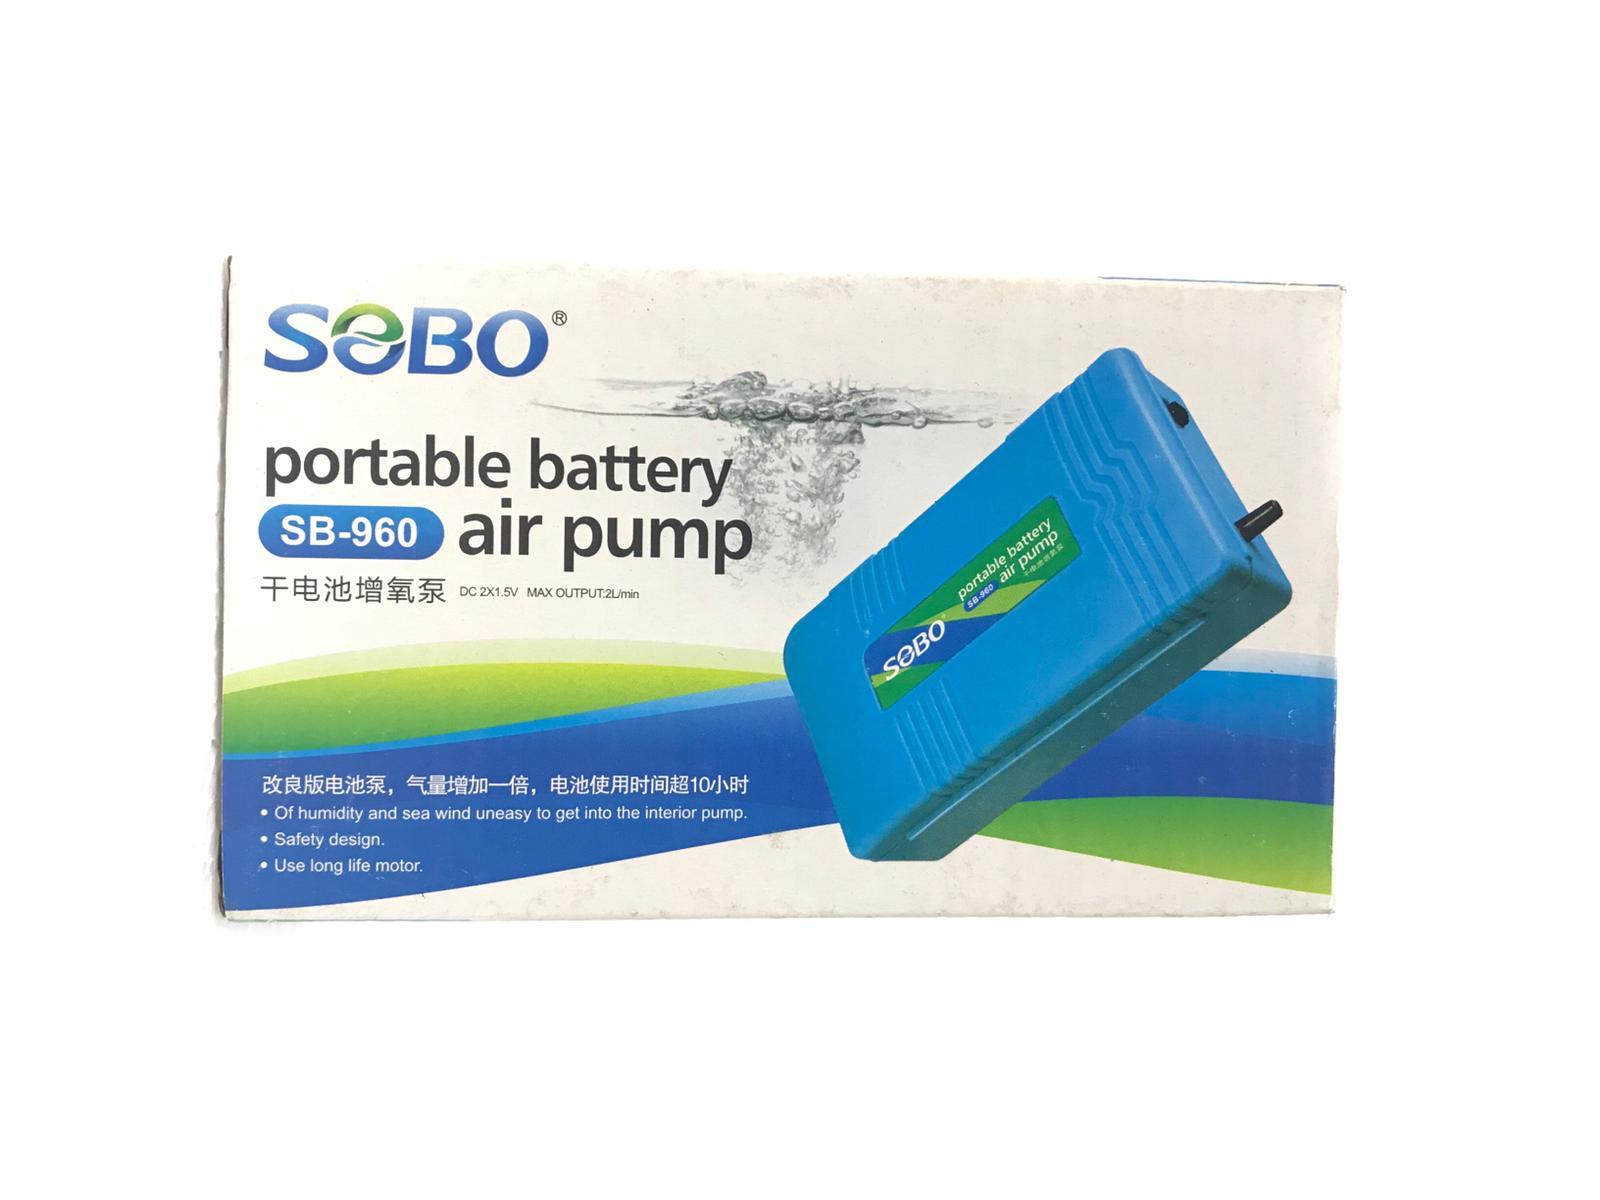 Sobo Portable Battery Air Pump SB Series